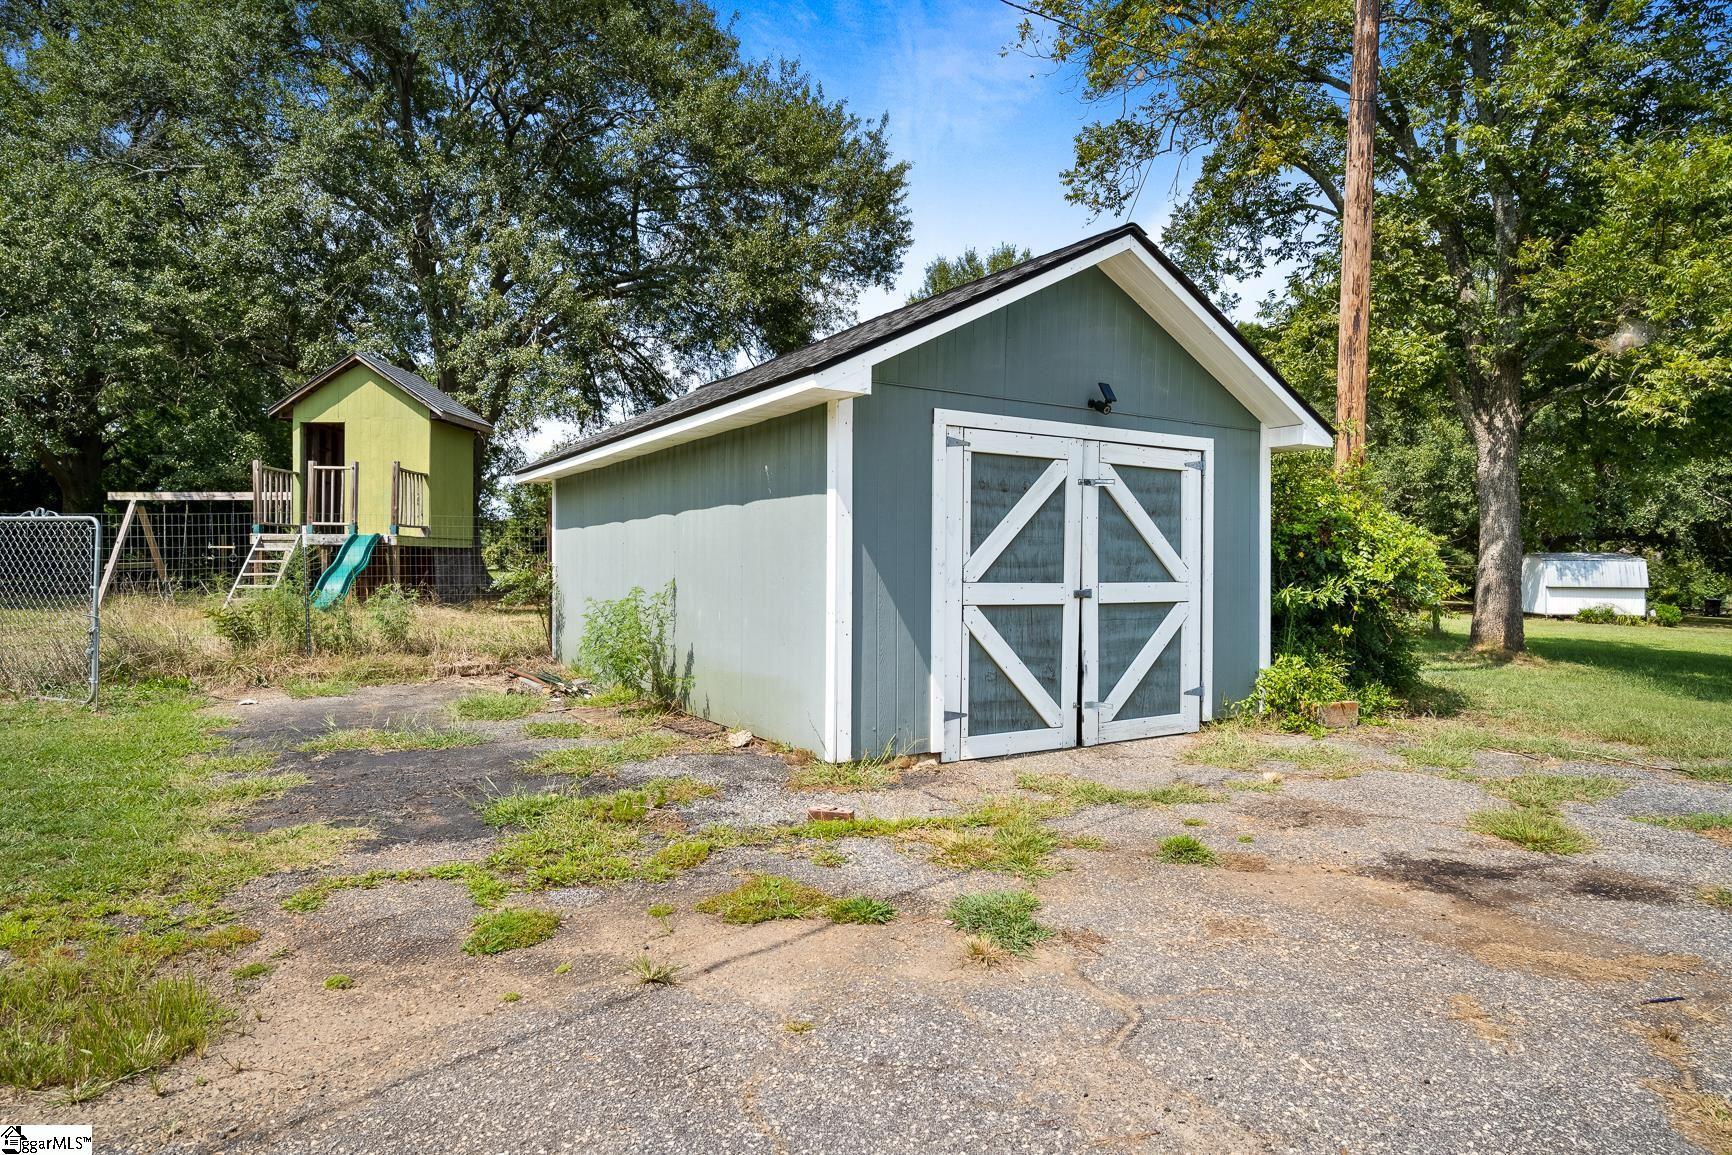 312 Oak Drive Extension Honea Path, SC 29654